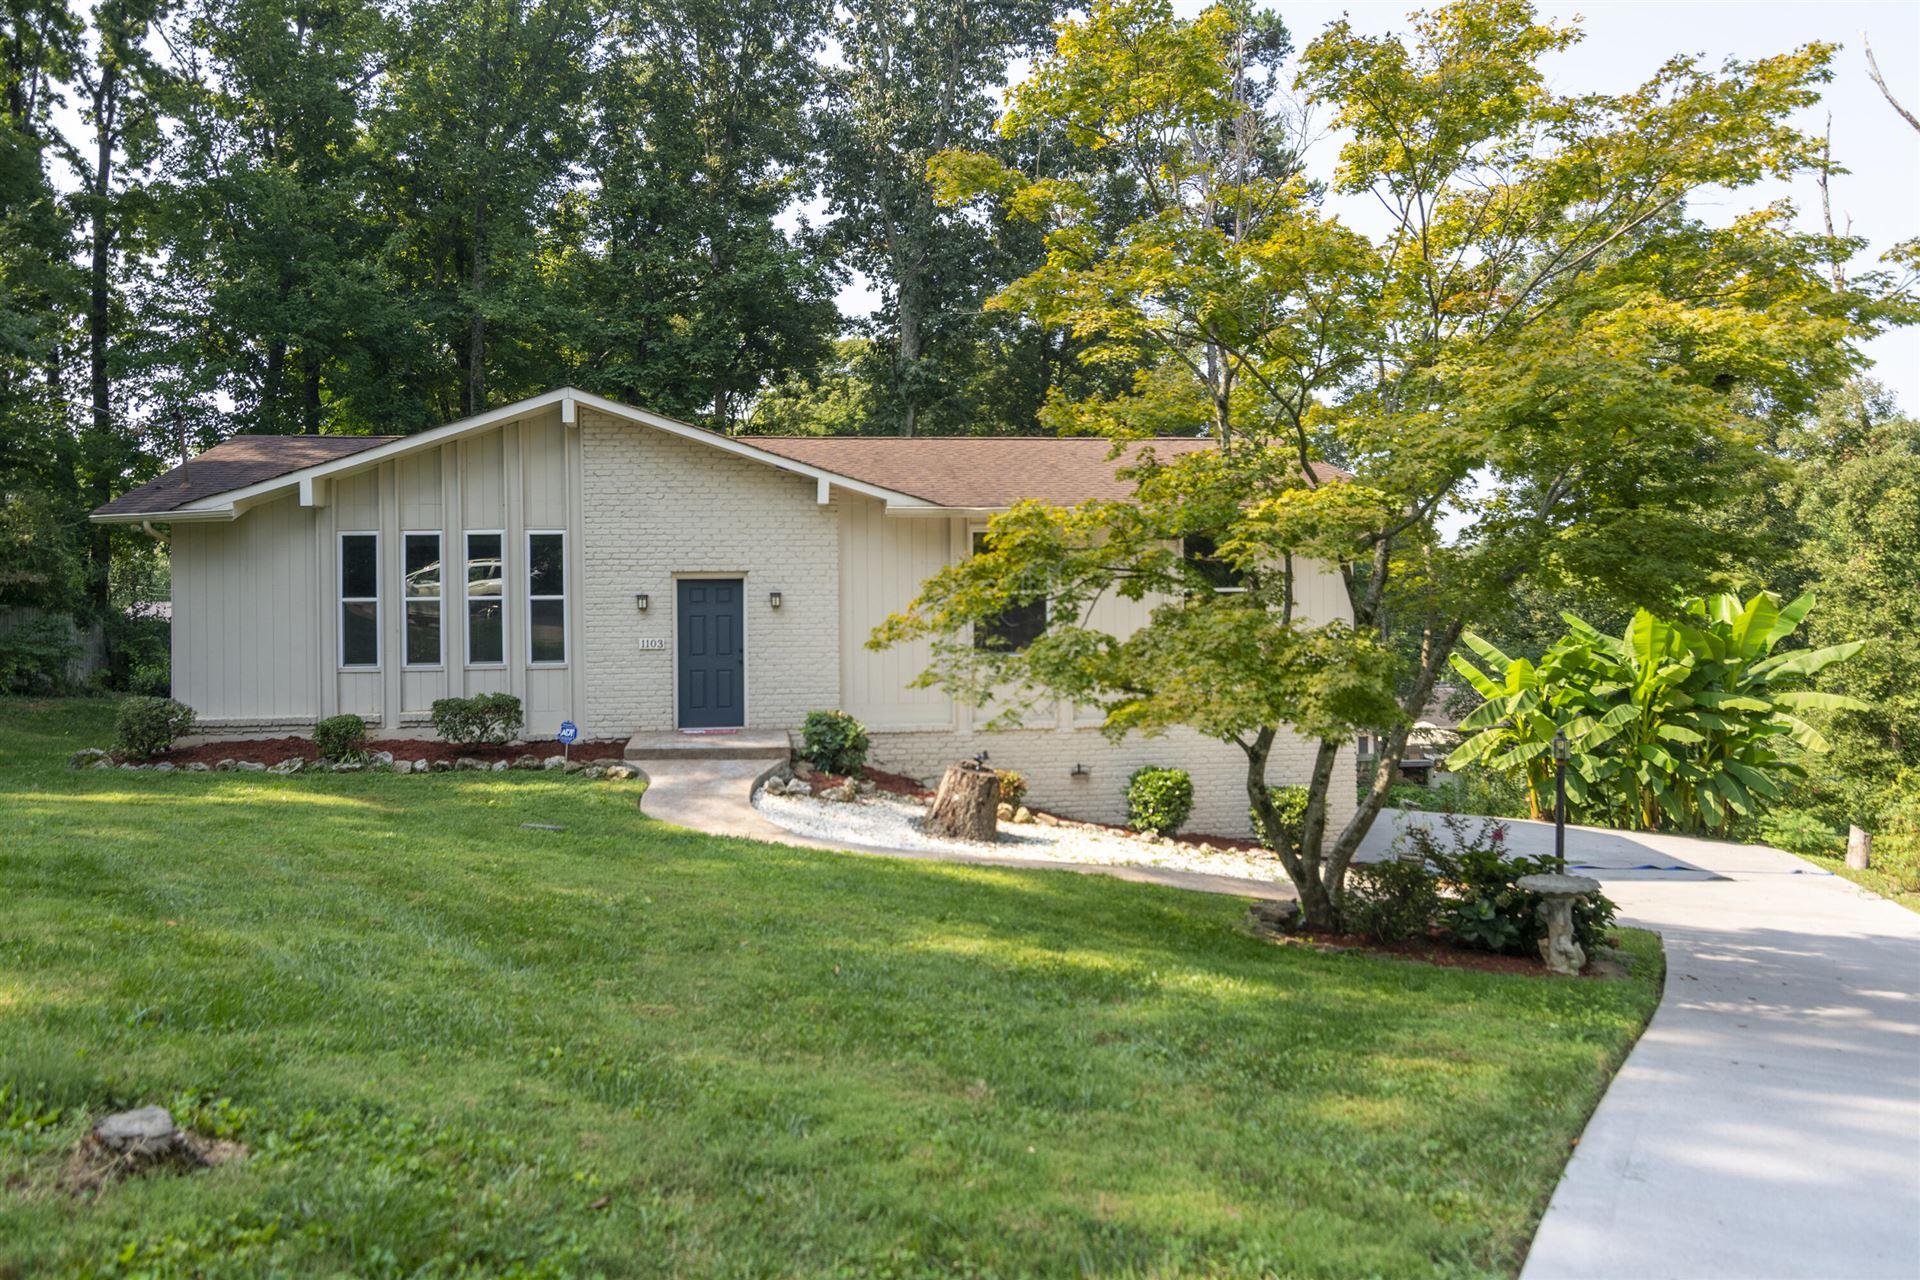 Photo of 1103 Green Oak Lane, Knoxville, TN 37932 (MLS # 1167652)